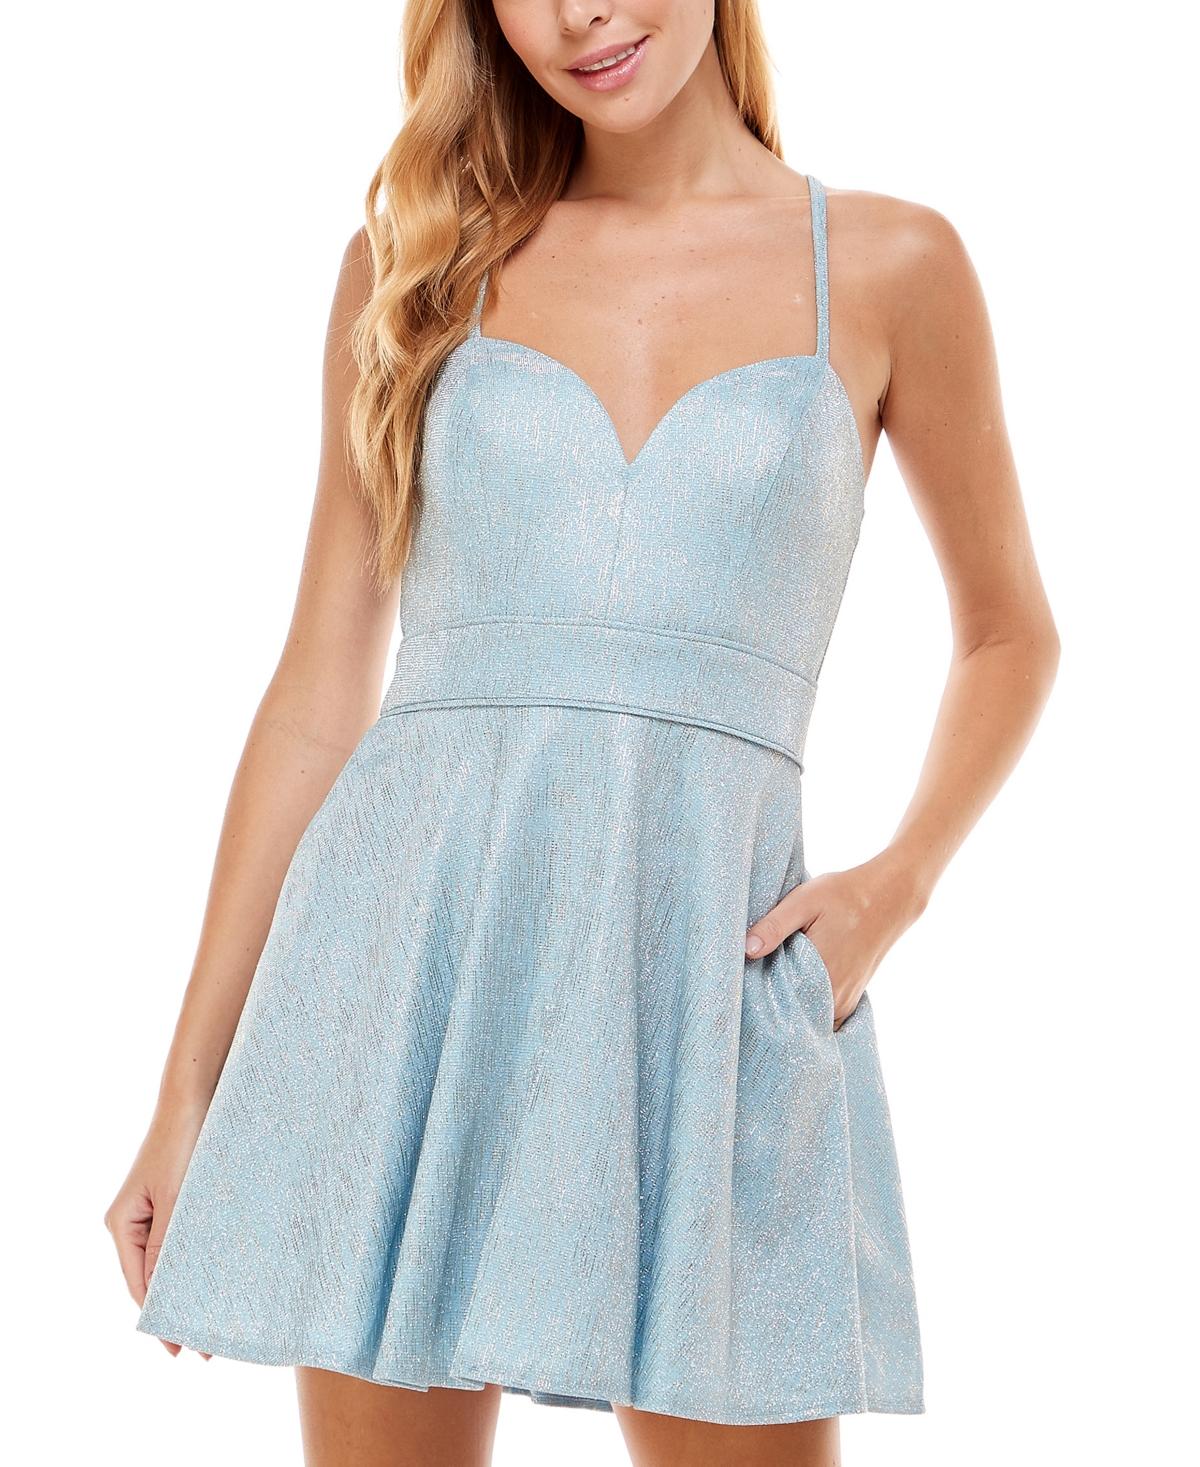 Crystal Doll Juniors' Sweetheart-Neck Shimmer Dress